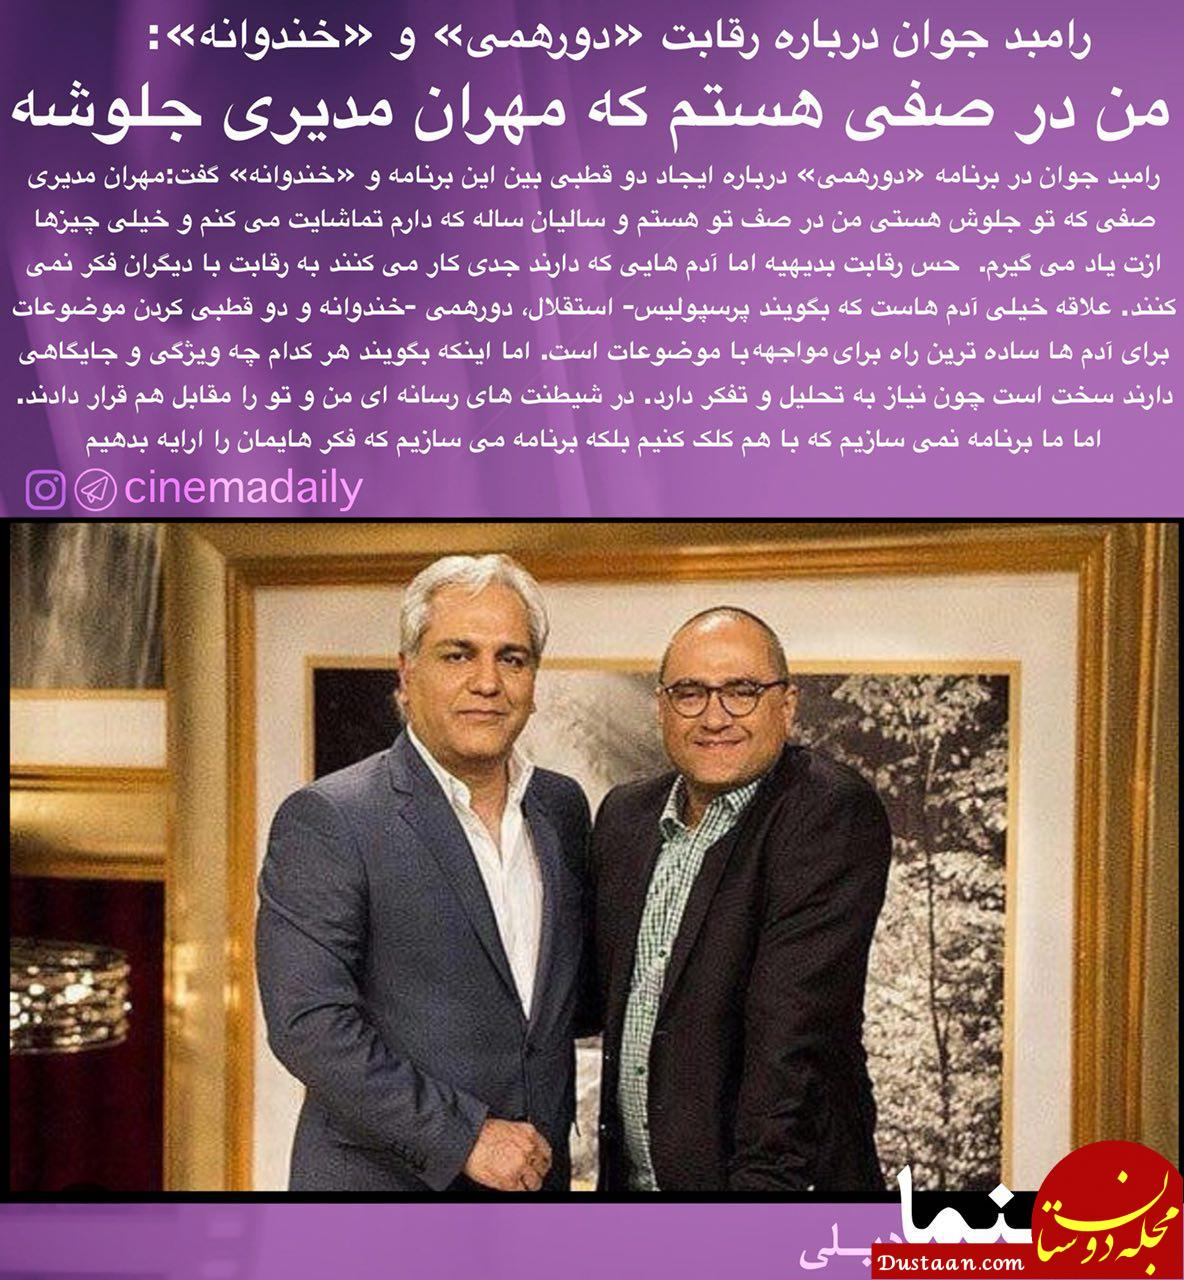 www.dustaan.com رامبد جوان: من درصفی هستم که مهران مدیری جلوشه